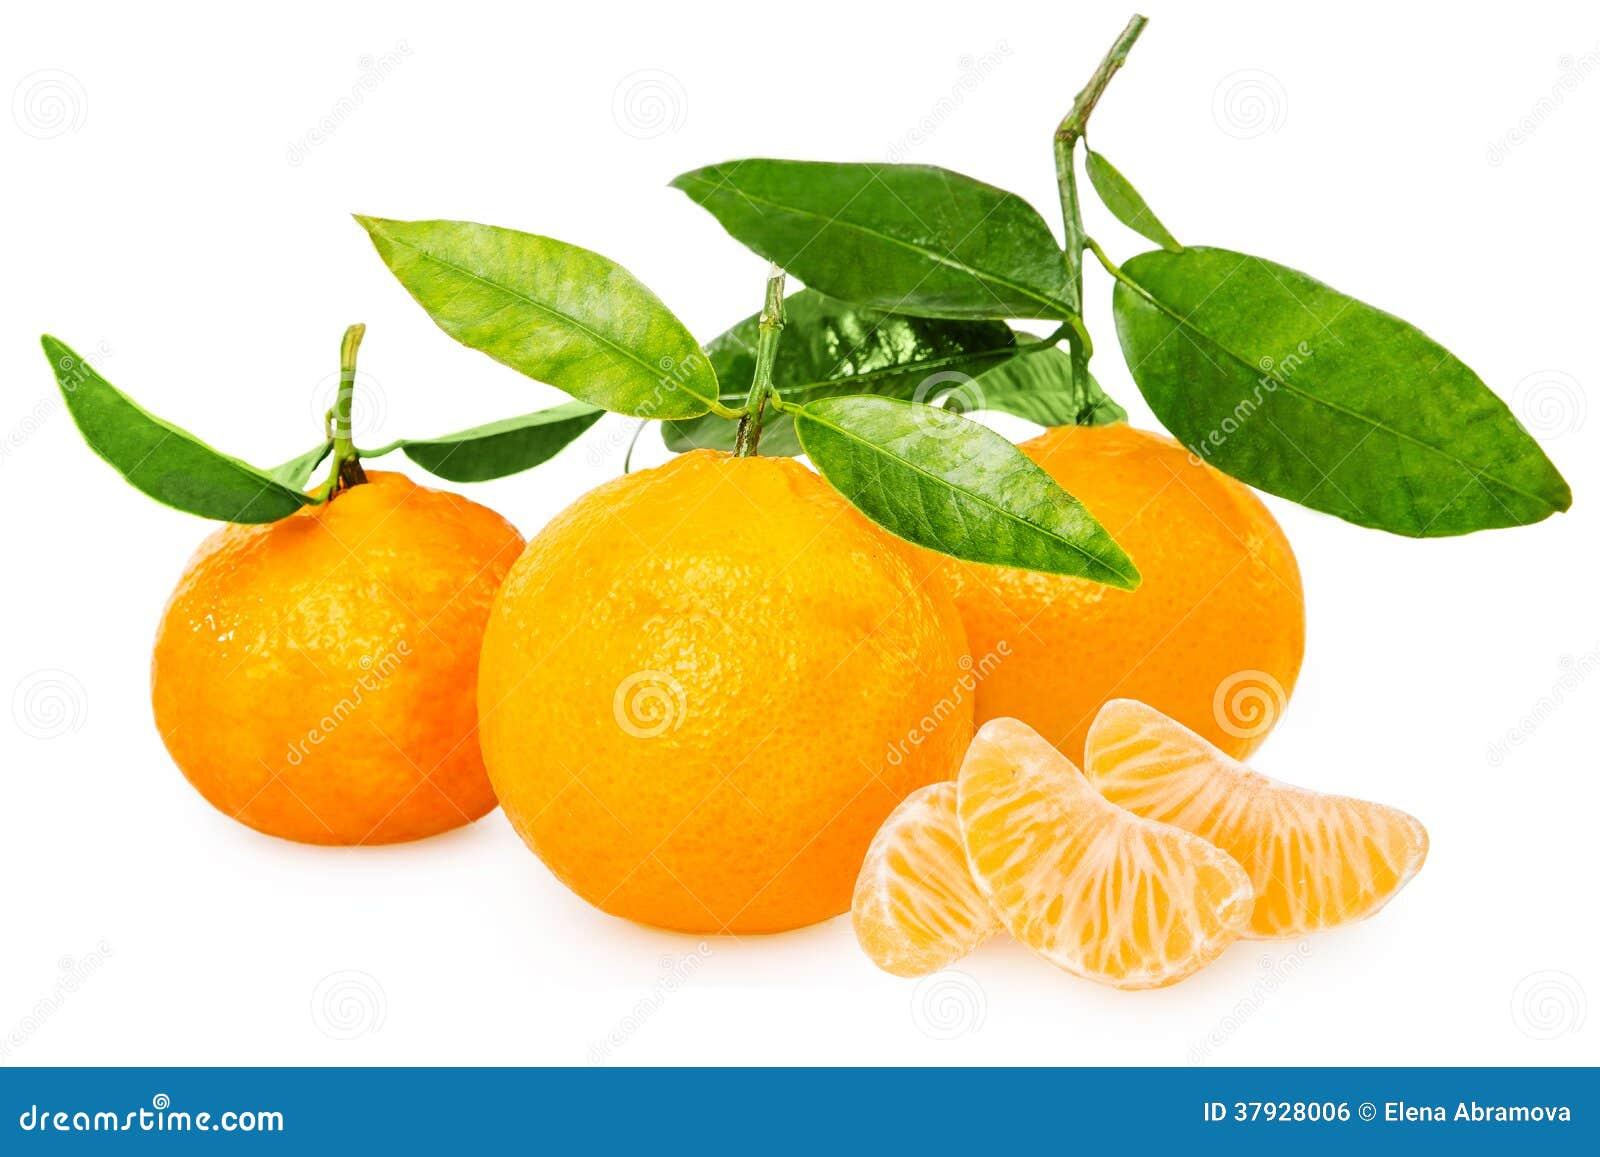 Mandarine avec des segments